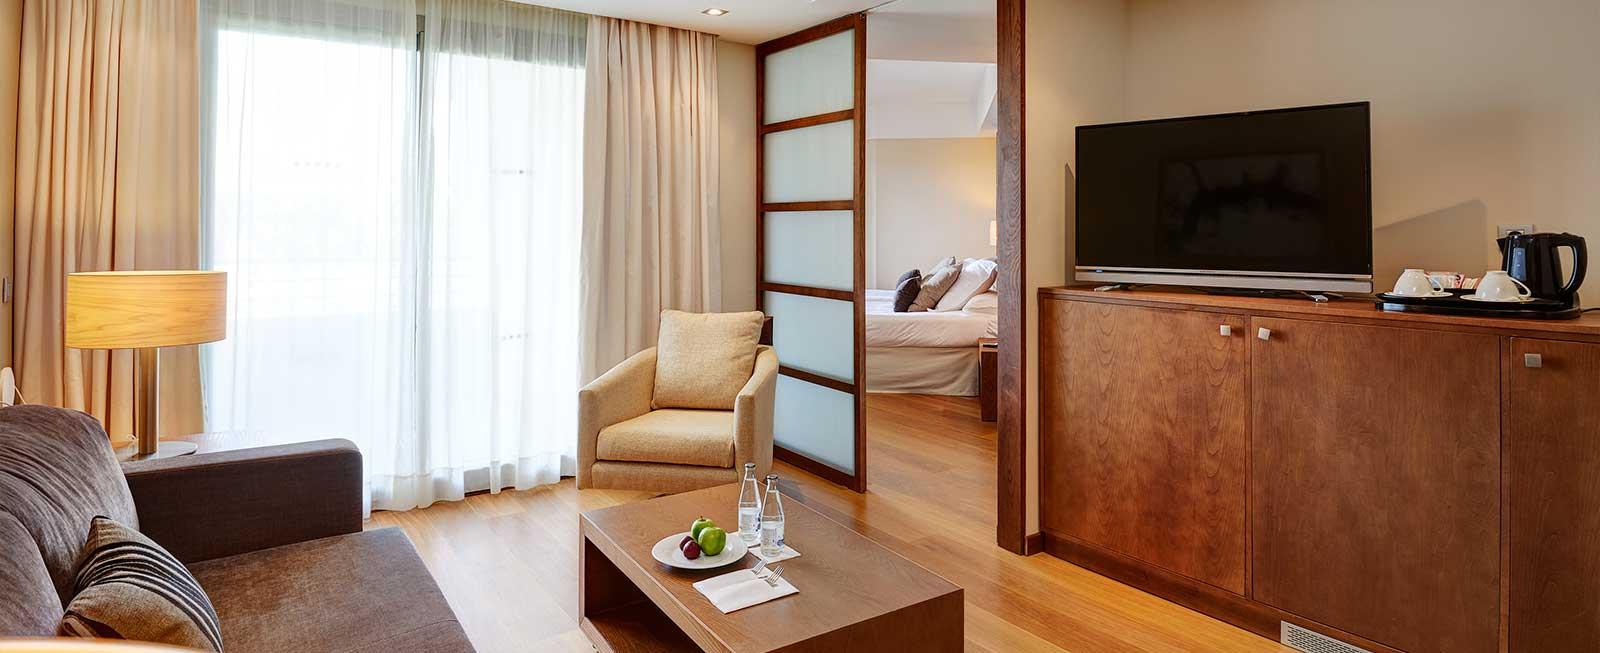 junior-suite-promo-biomar-hotel-sa-coma